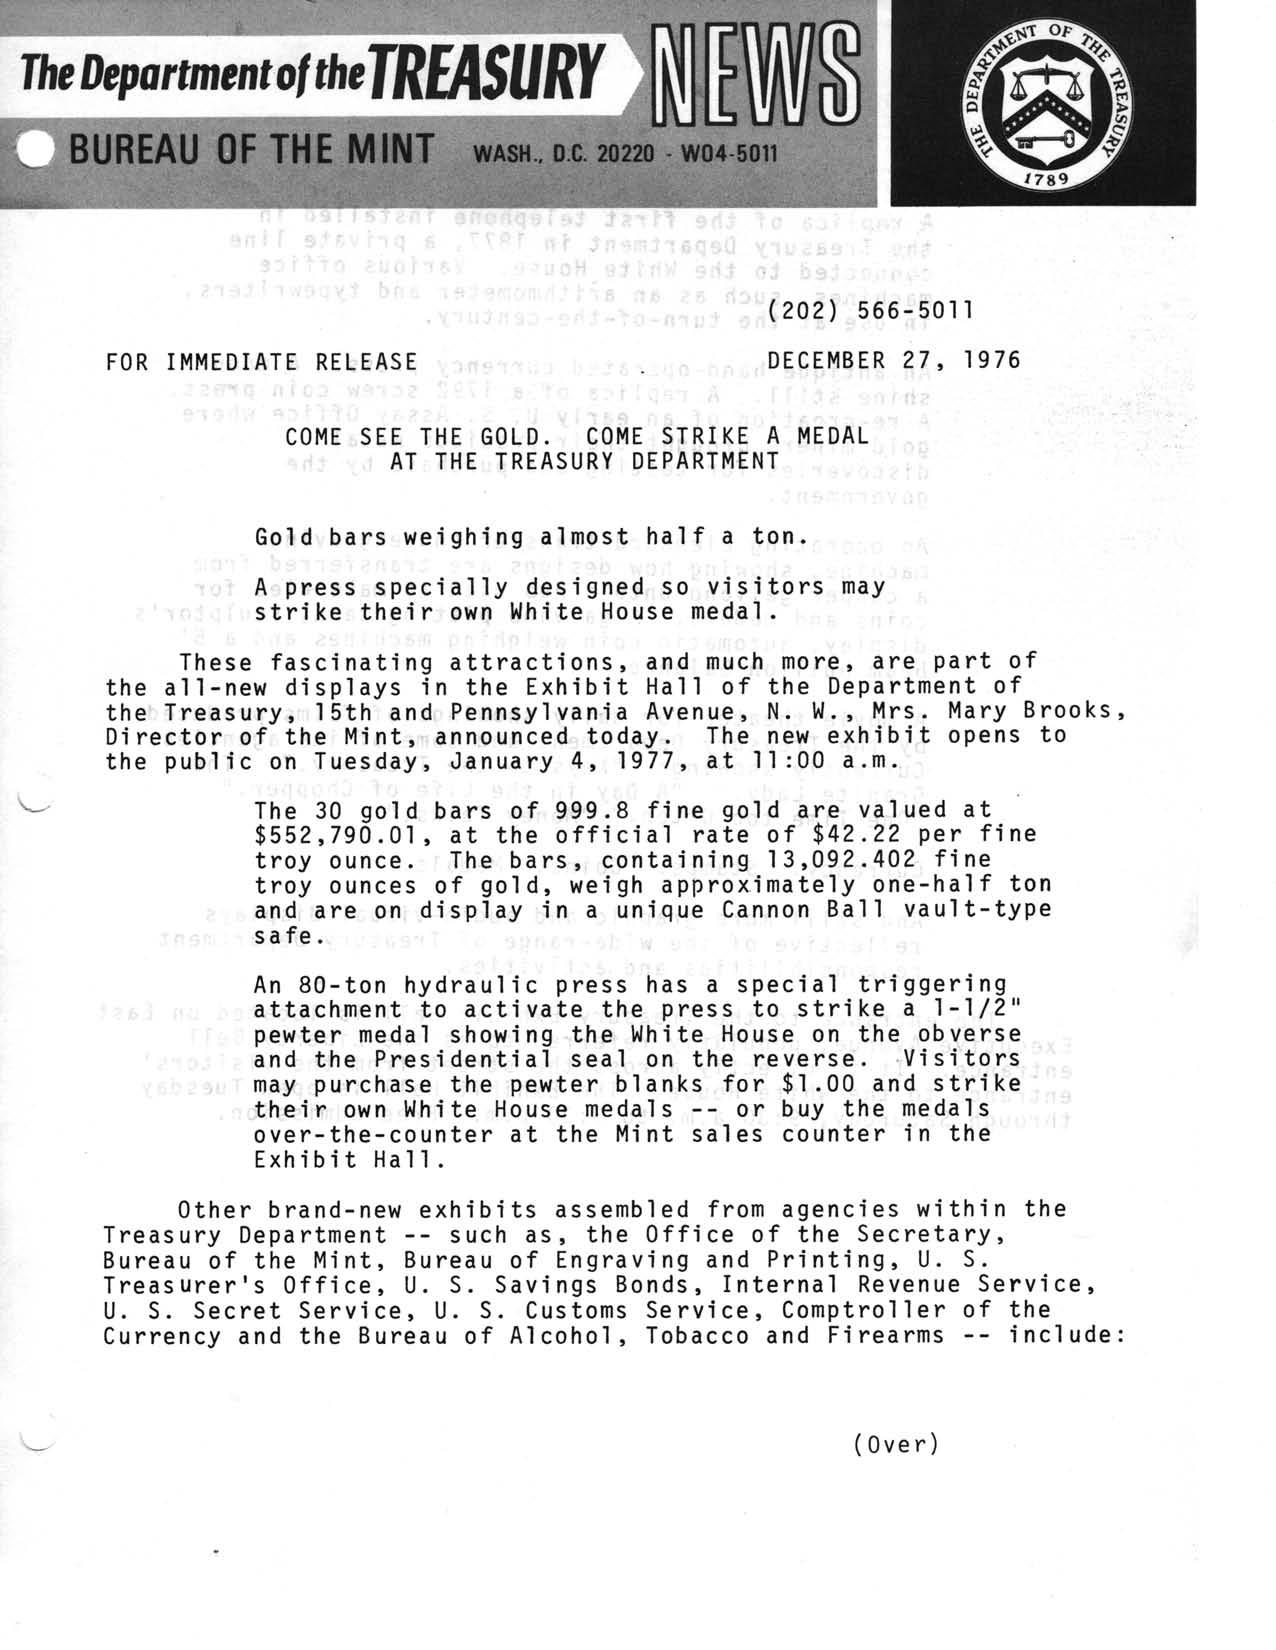 Historic Press Release: New Treasury Exhibit Displays, Page 1